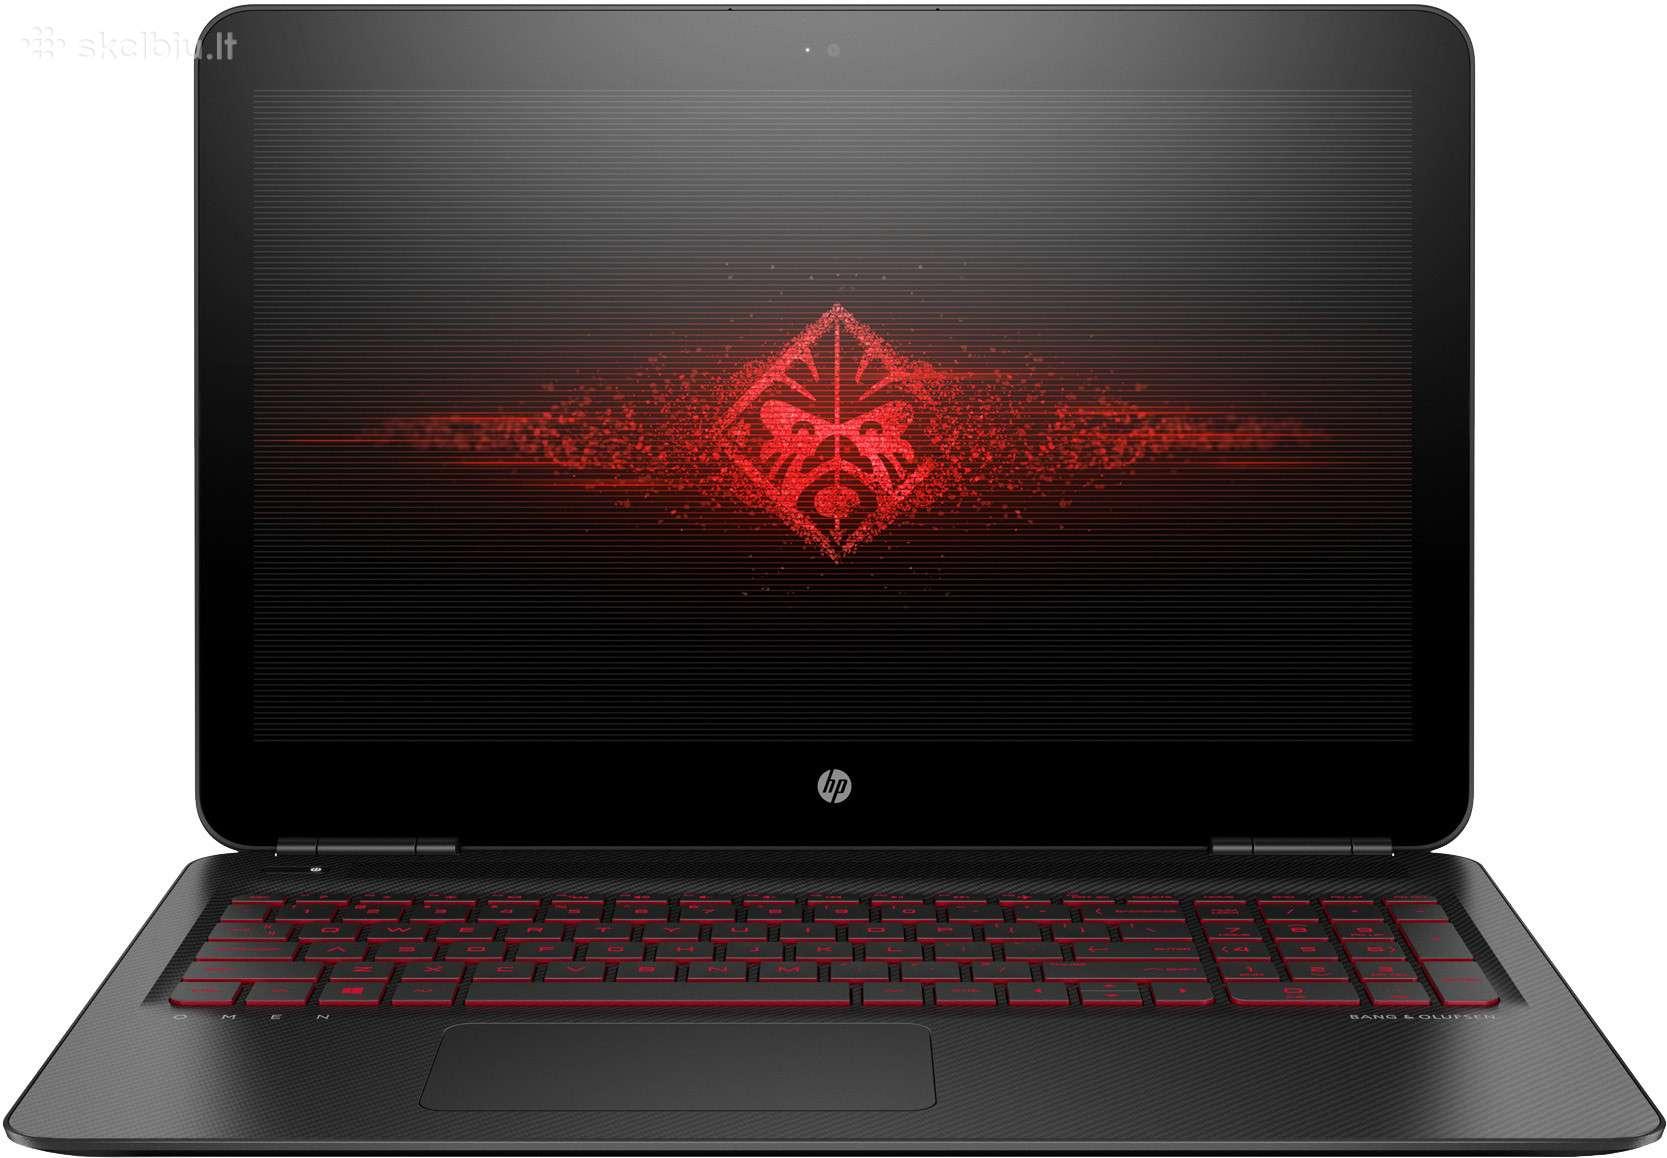 Hp Omen I7 7700hq Gtx1060 6gb Zbook Notebookas Dell Inspiron 15 7567 I5 7300hq 4gb Ddr4 Gtx 1050 Ti Win10 Black